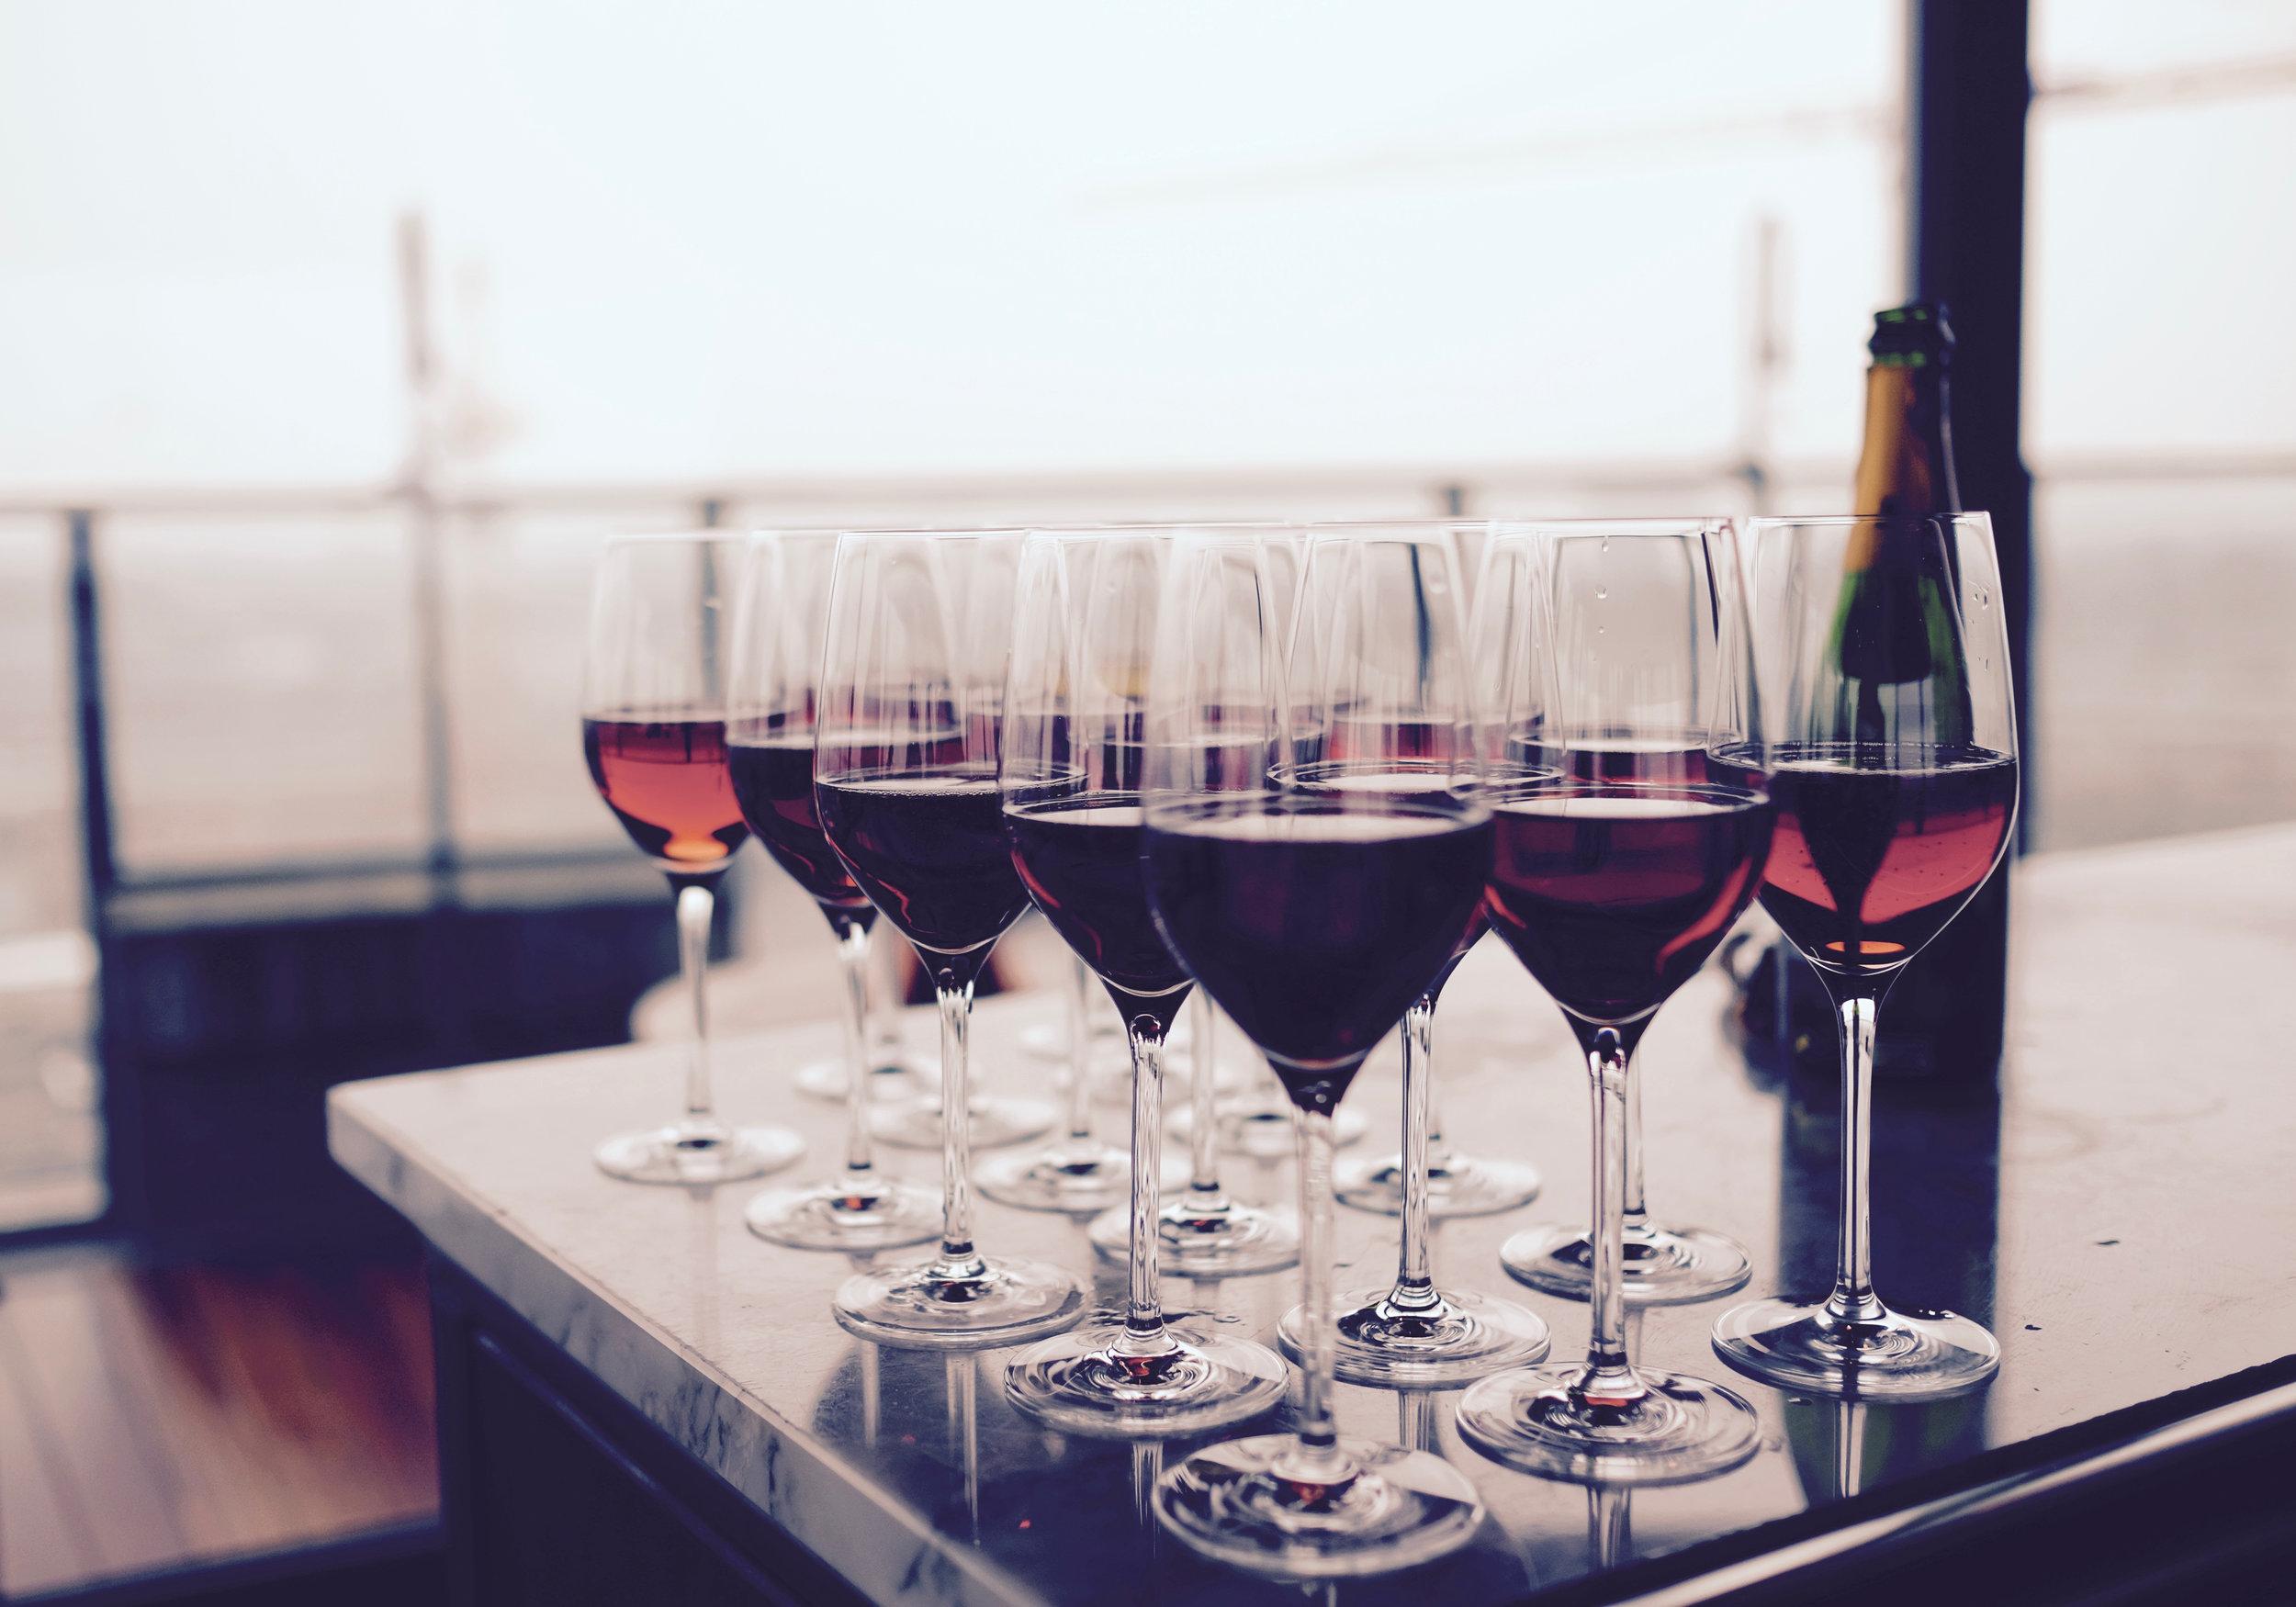 Wine glasses images.jpeg